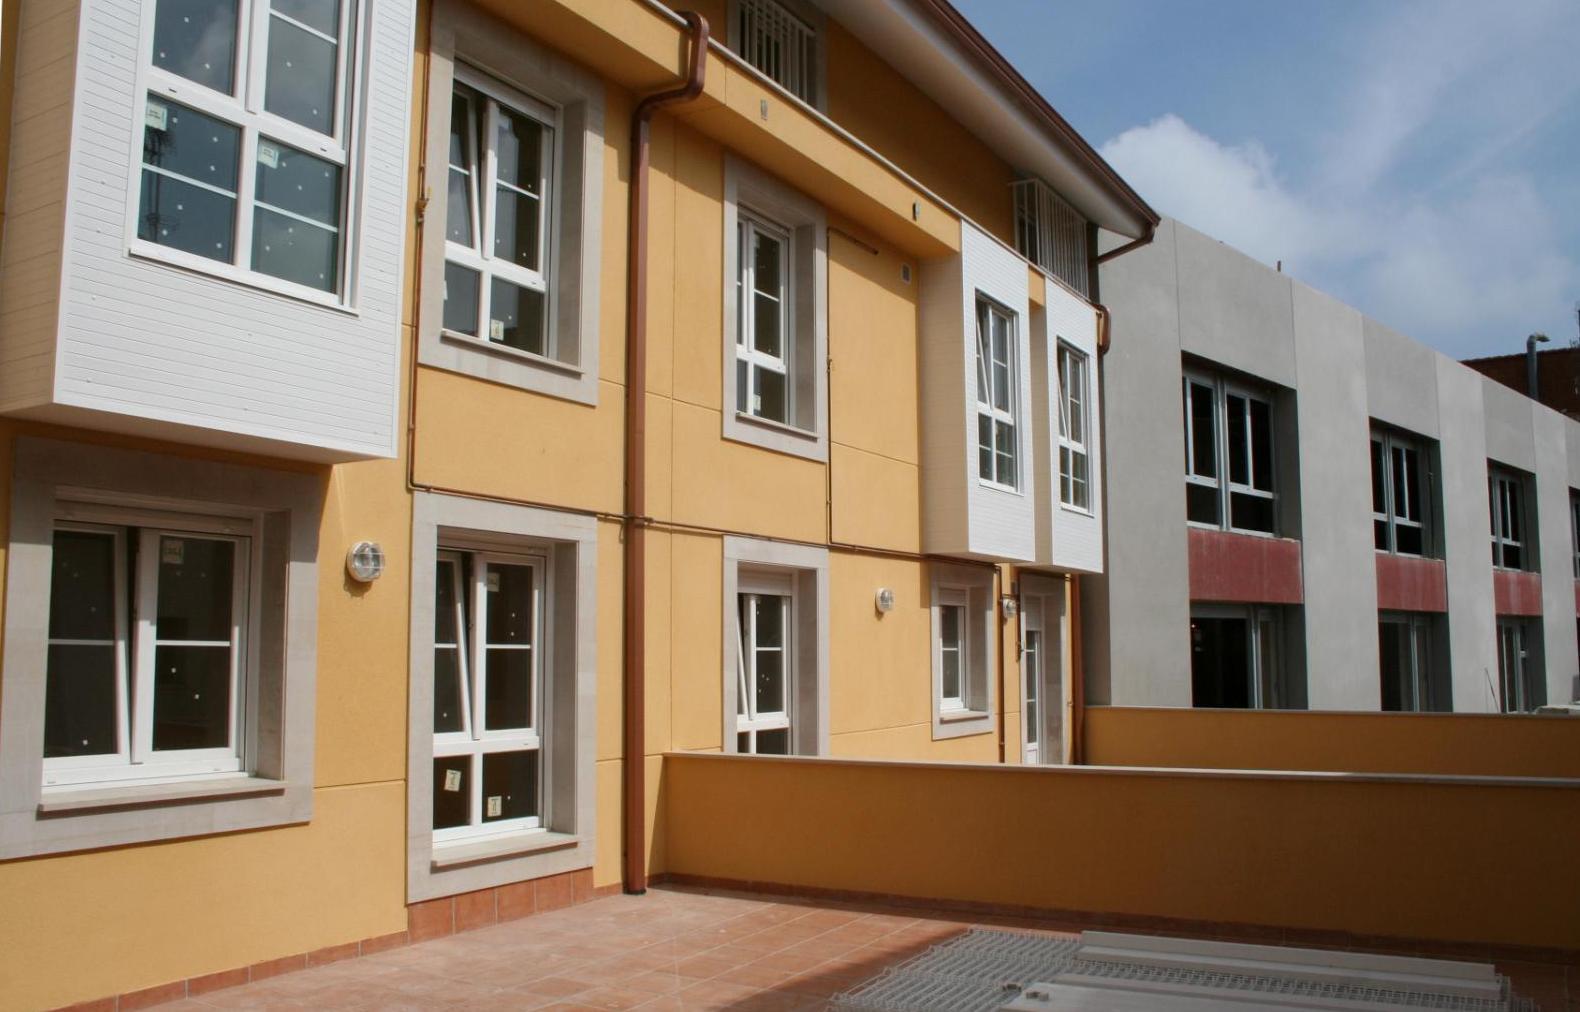 Arquitecto en cudillero asturias viviendas cand s foto - Arquitectos asturias ...